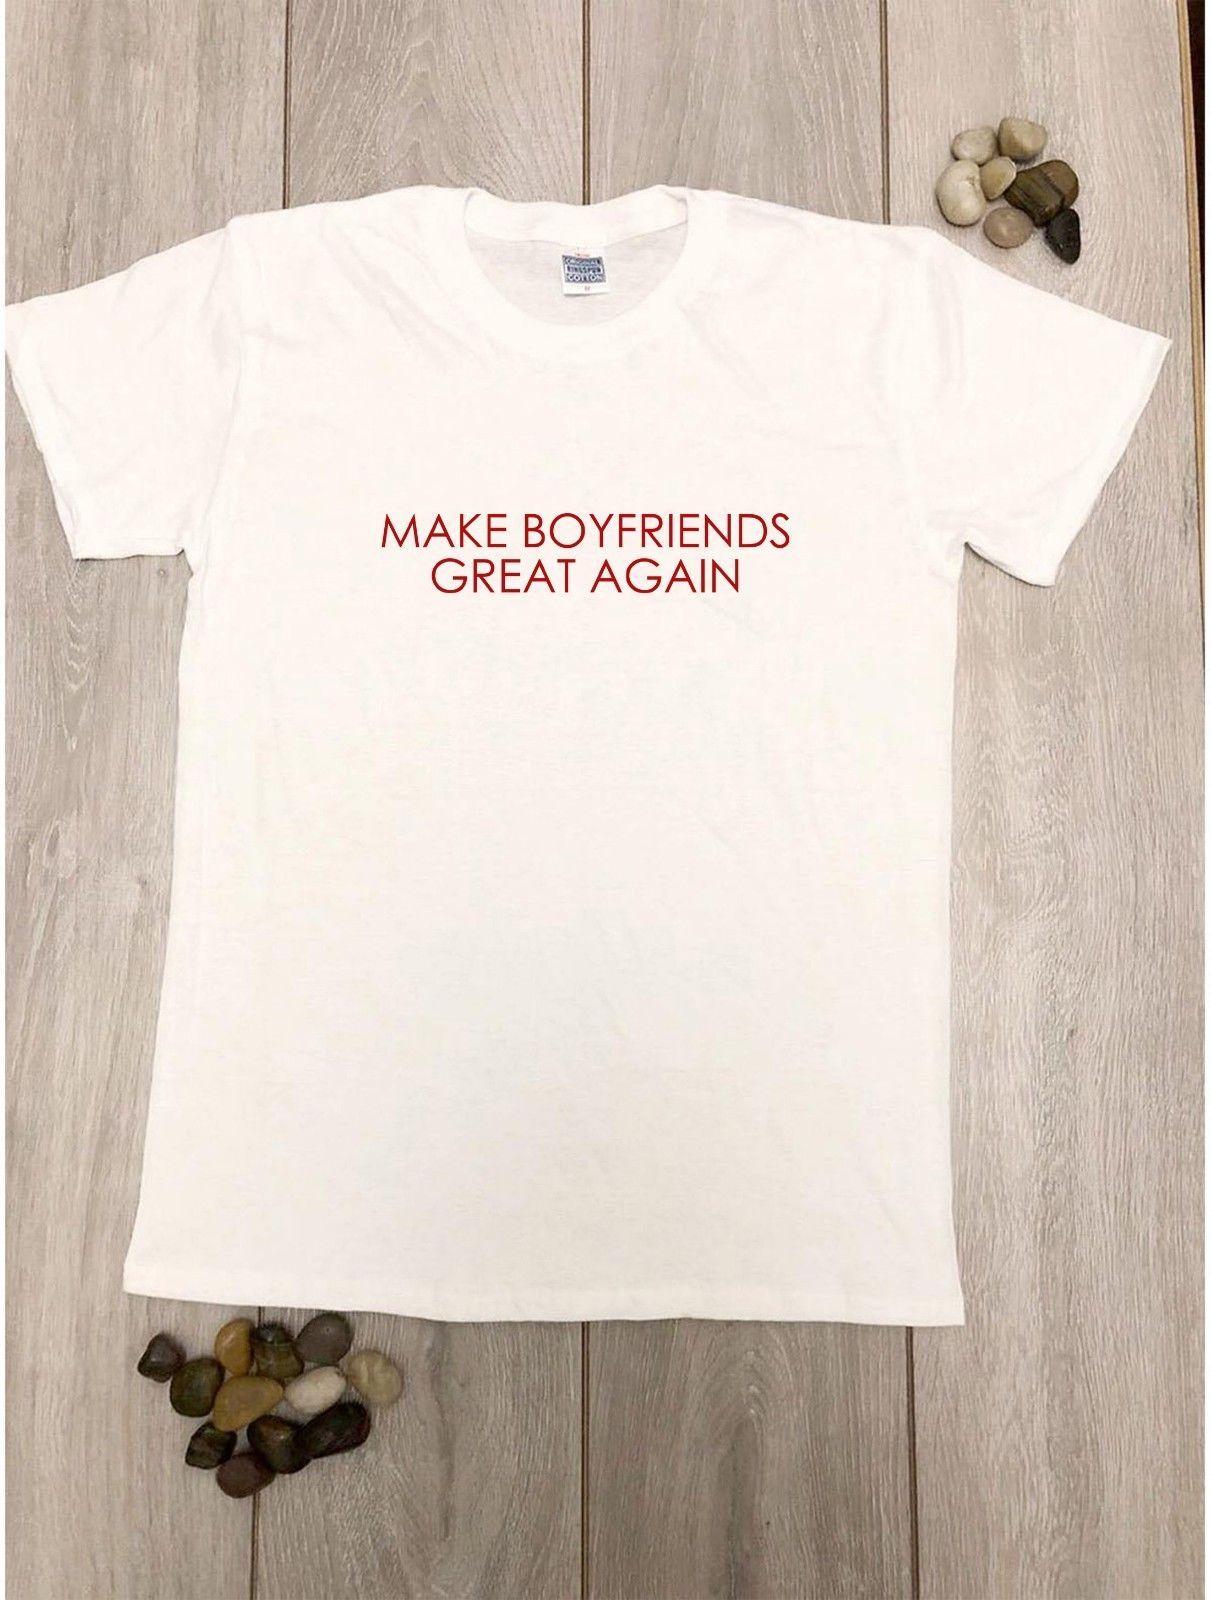 Make Boyfriends Great Again T Shirt Slogan Tee Womens Gift Funny Joke Ladies Top